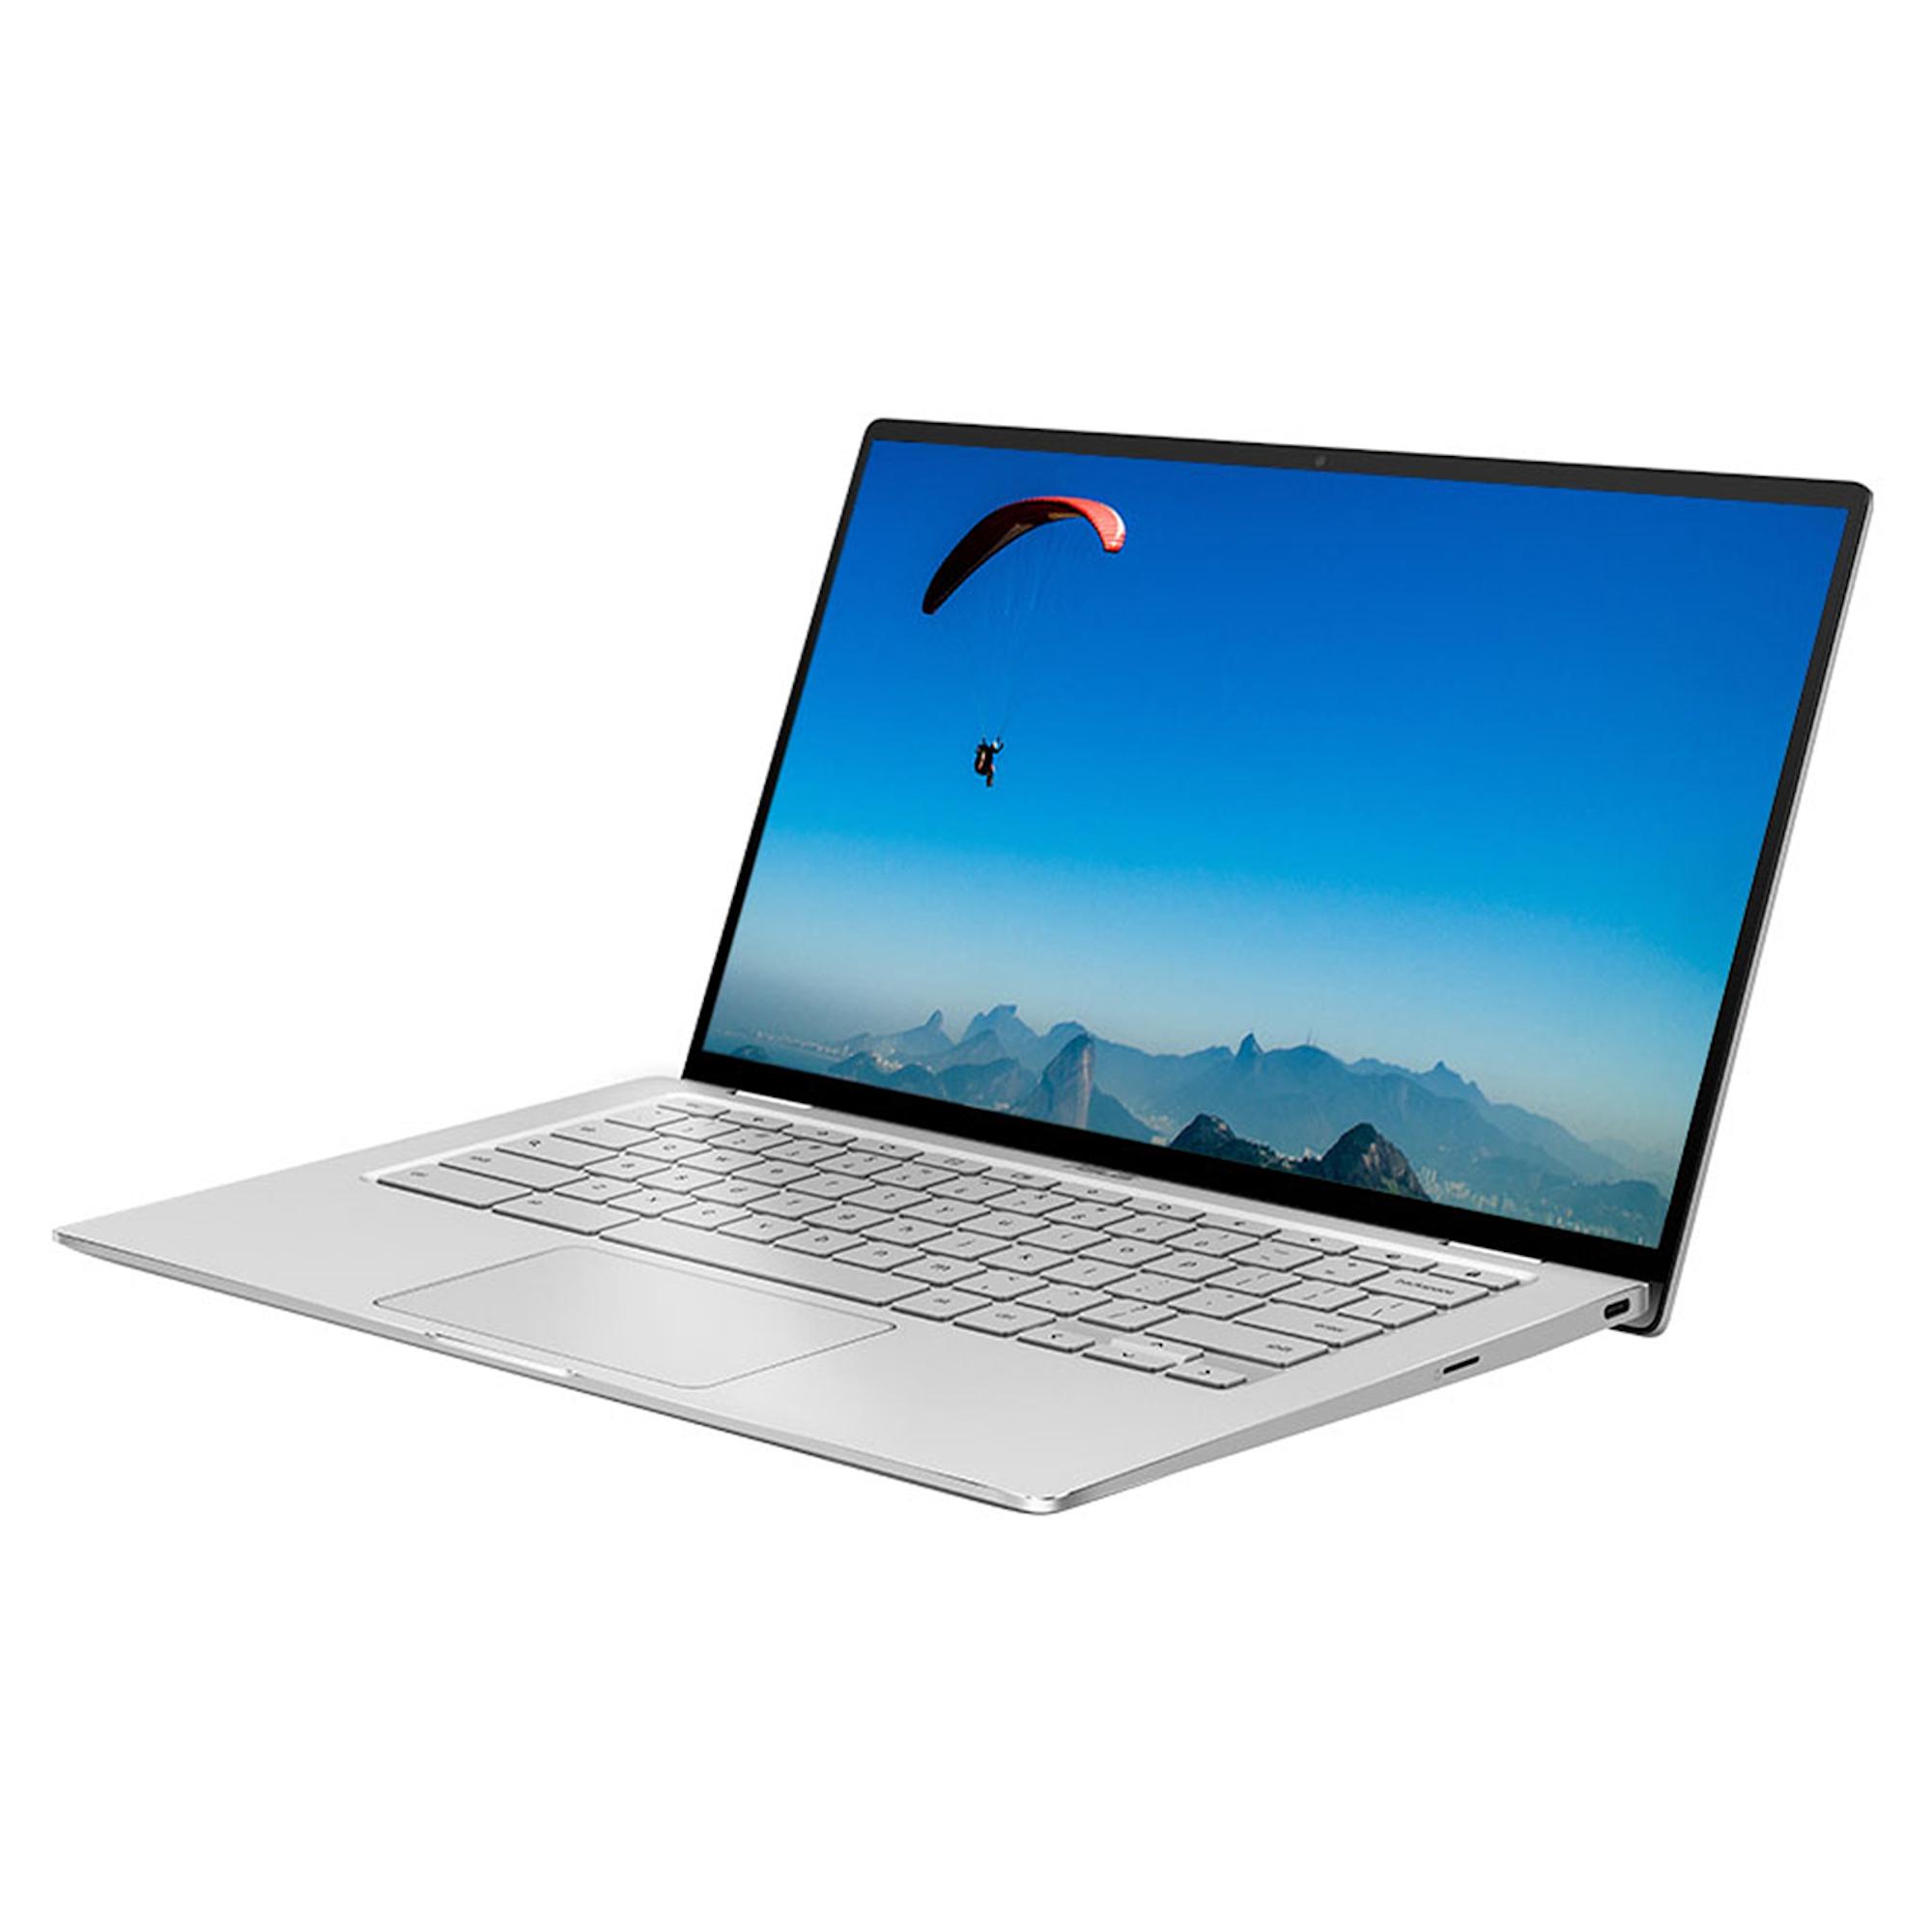 "ASUS C434TA 14"" Intel Core M3 4GB 128GB Chromebook"